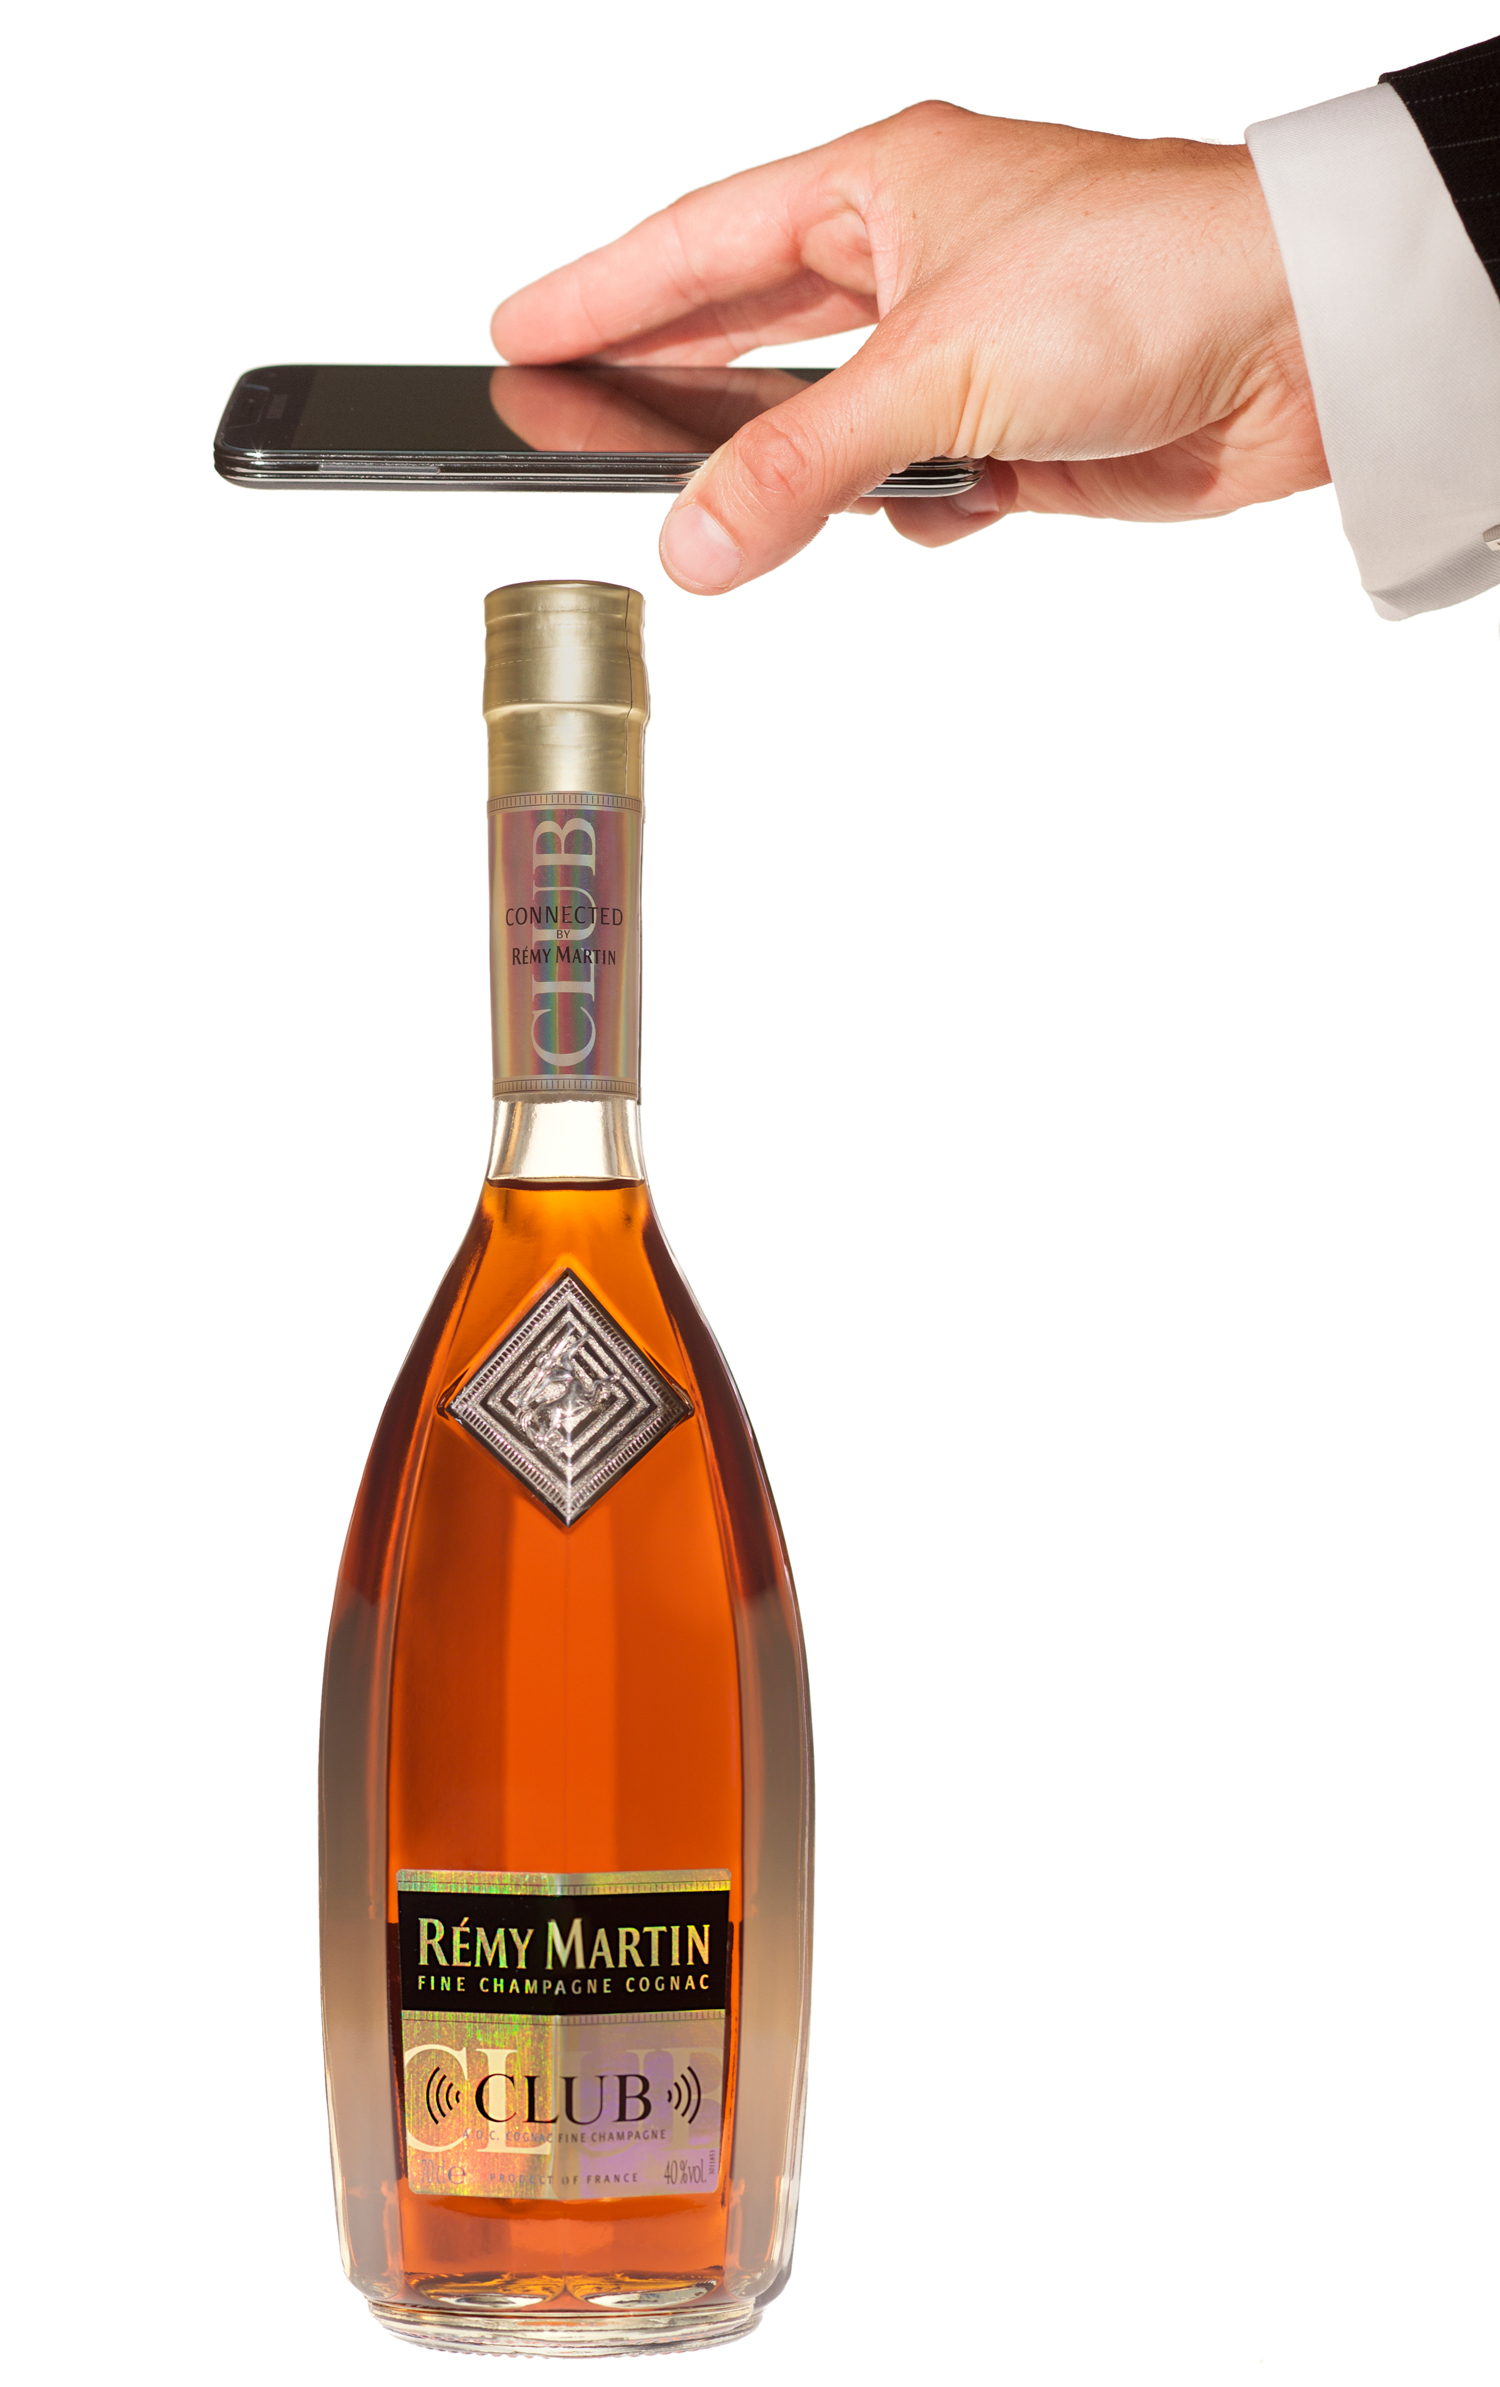 NFC smart bottle technology